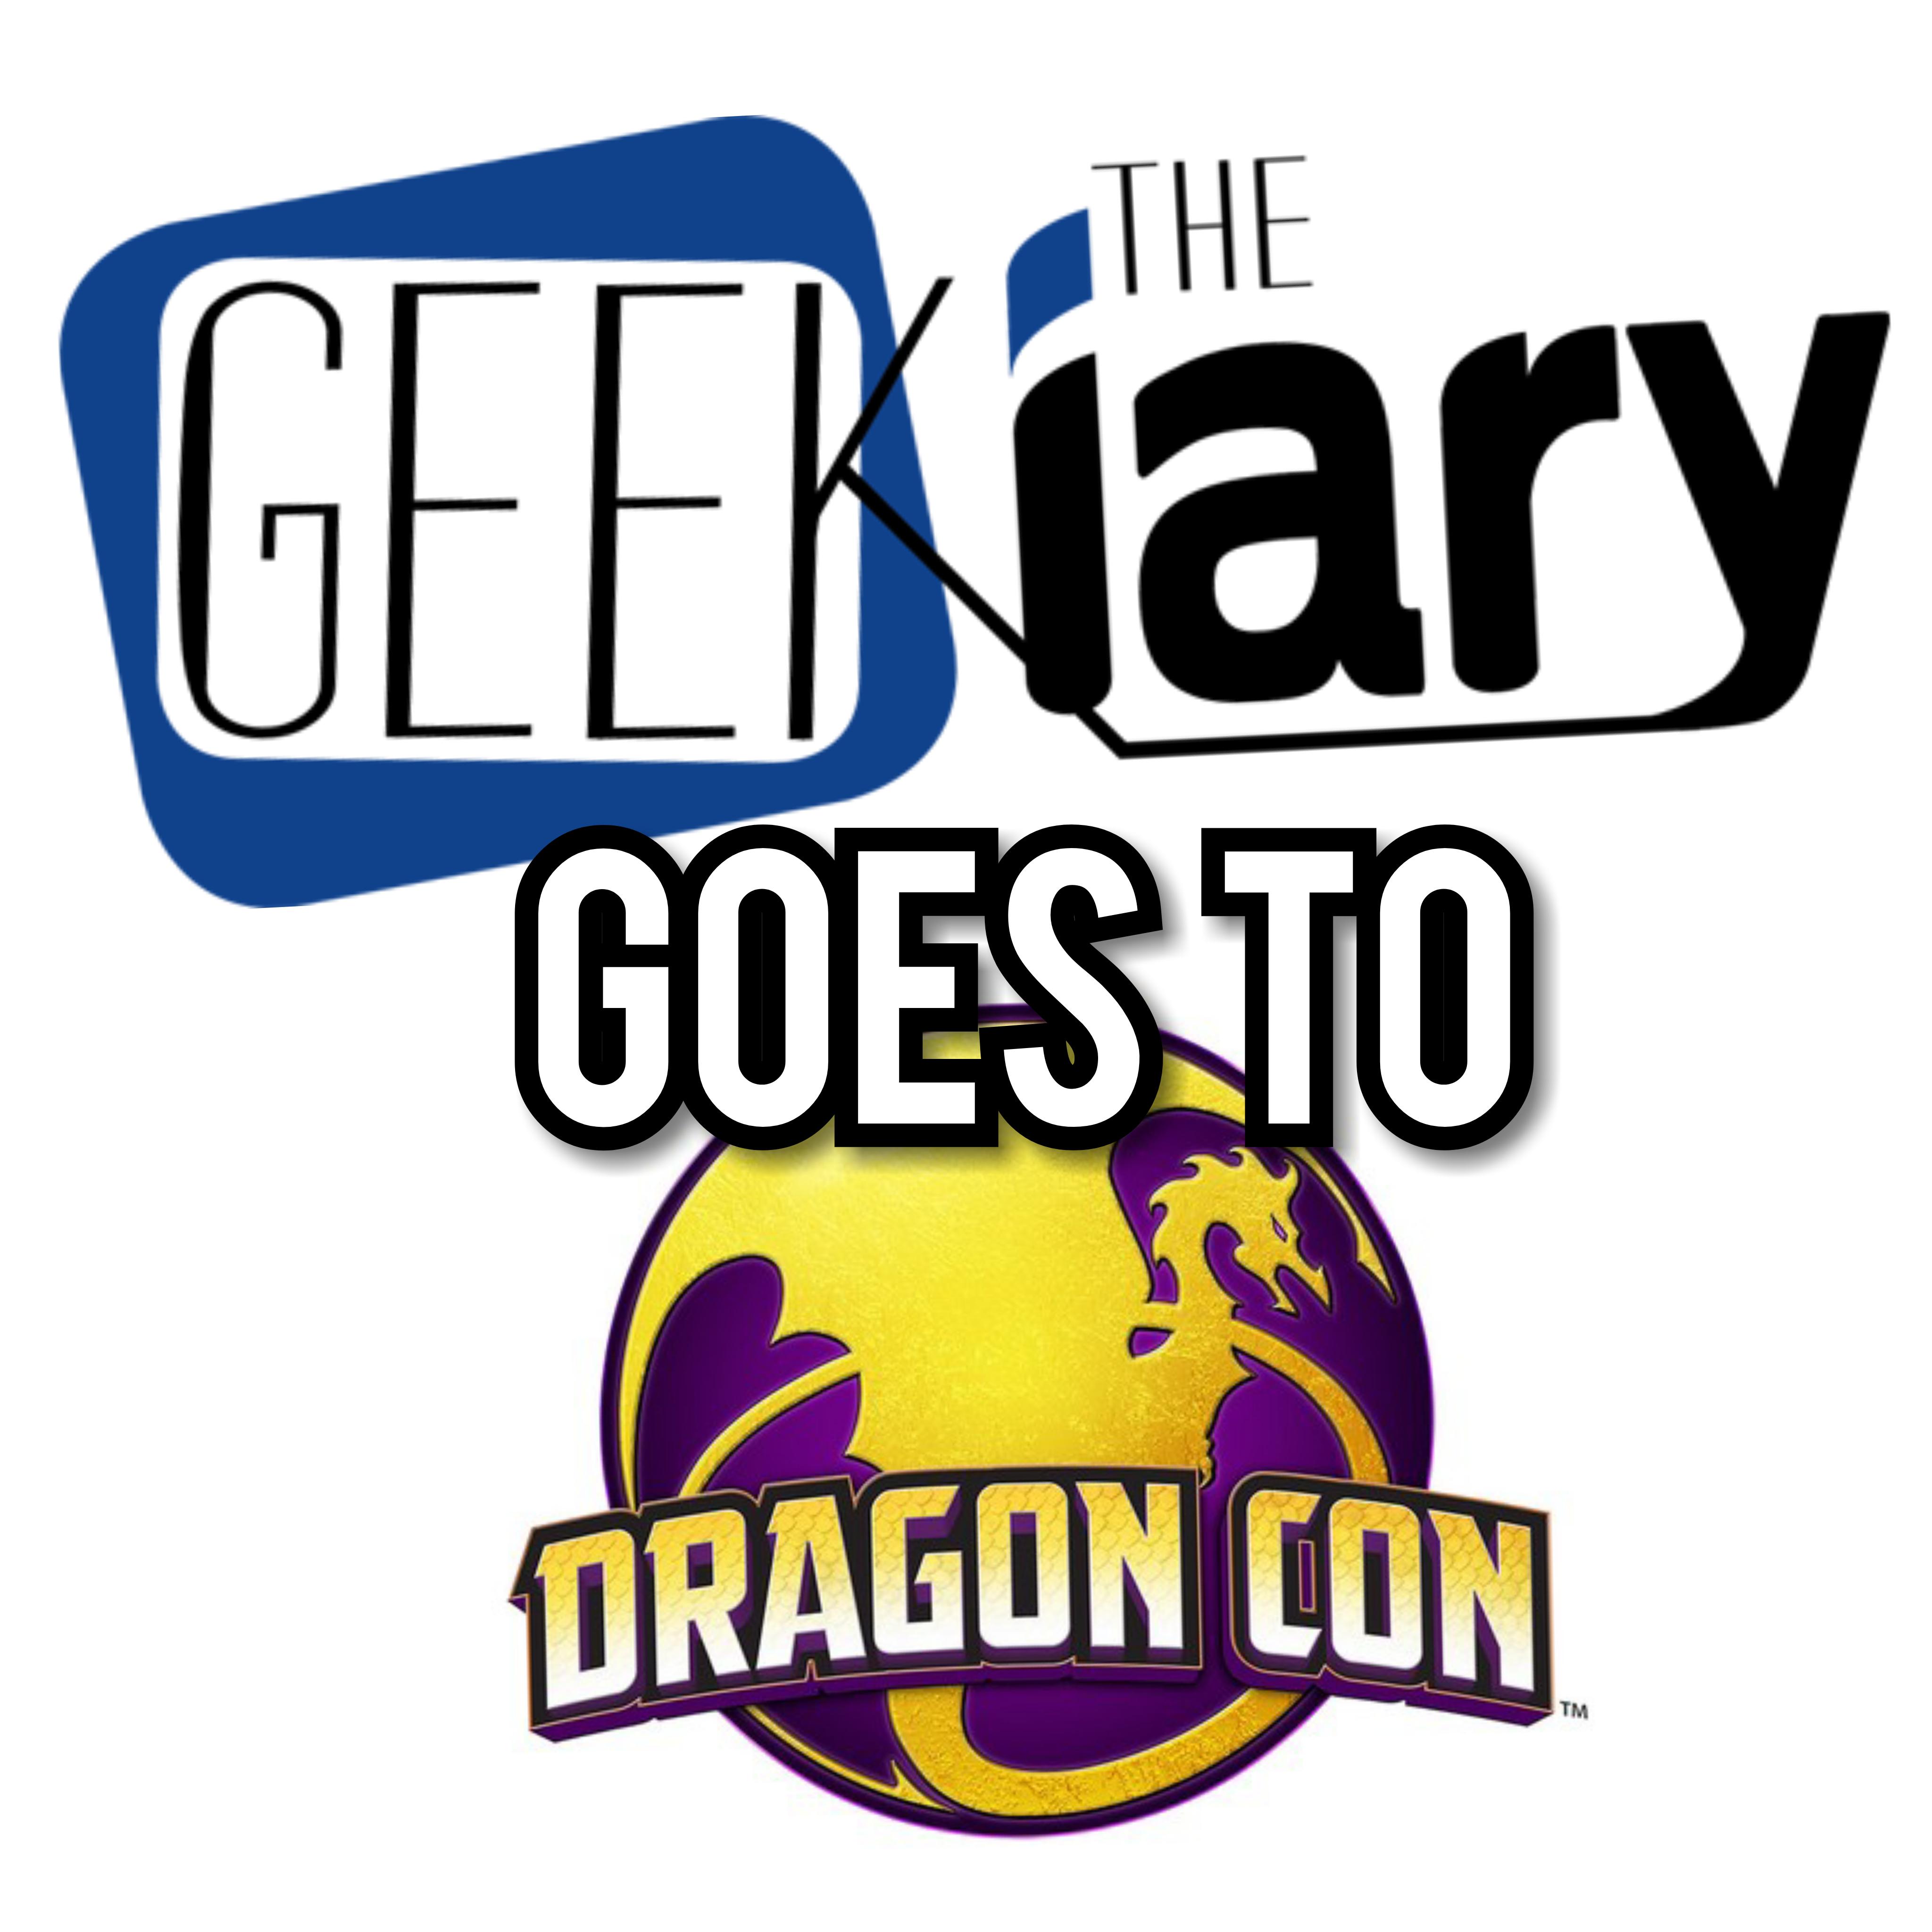 TheGeekiaryGoesToDragonCon2018